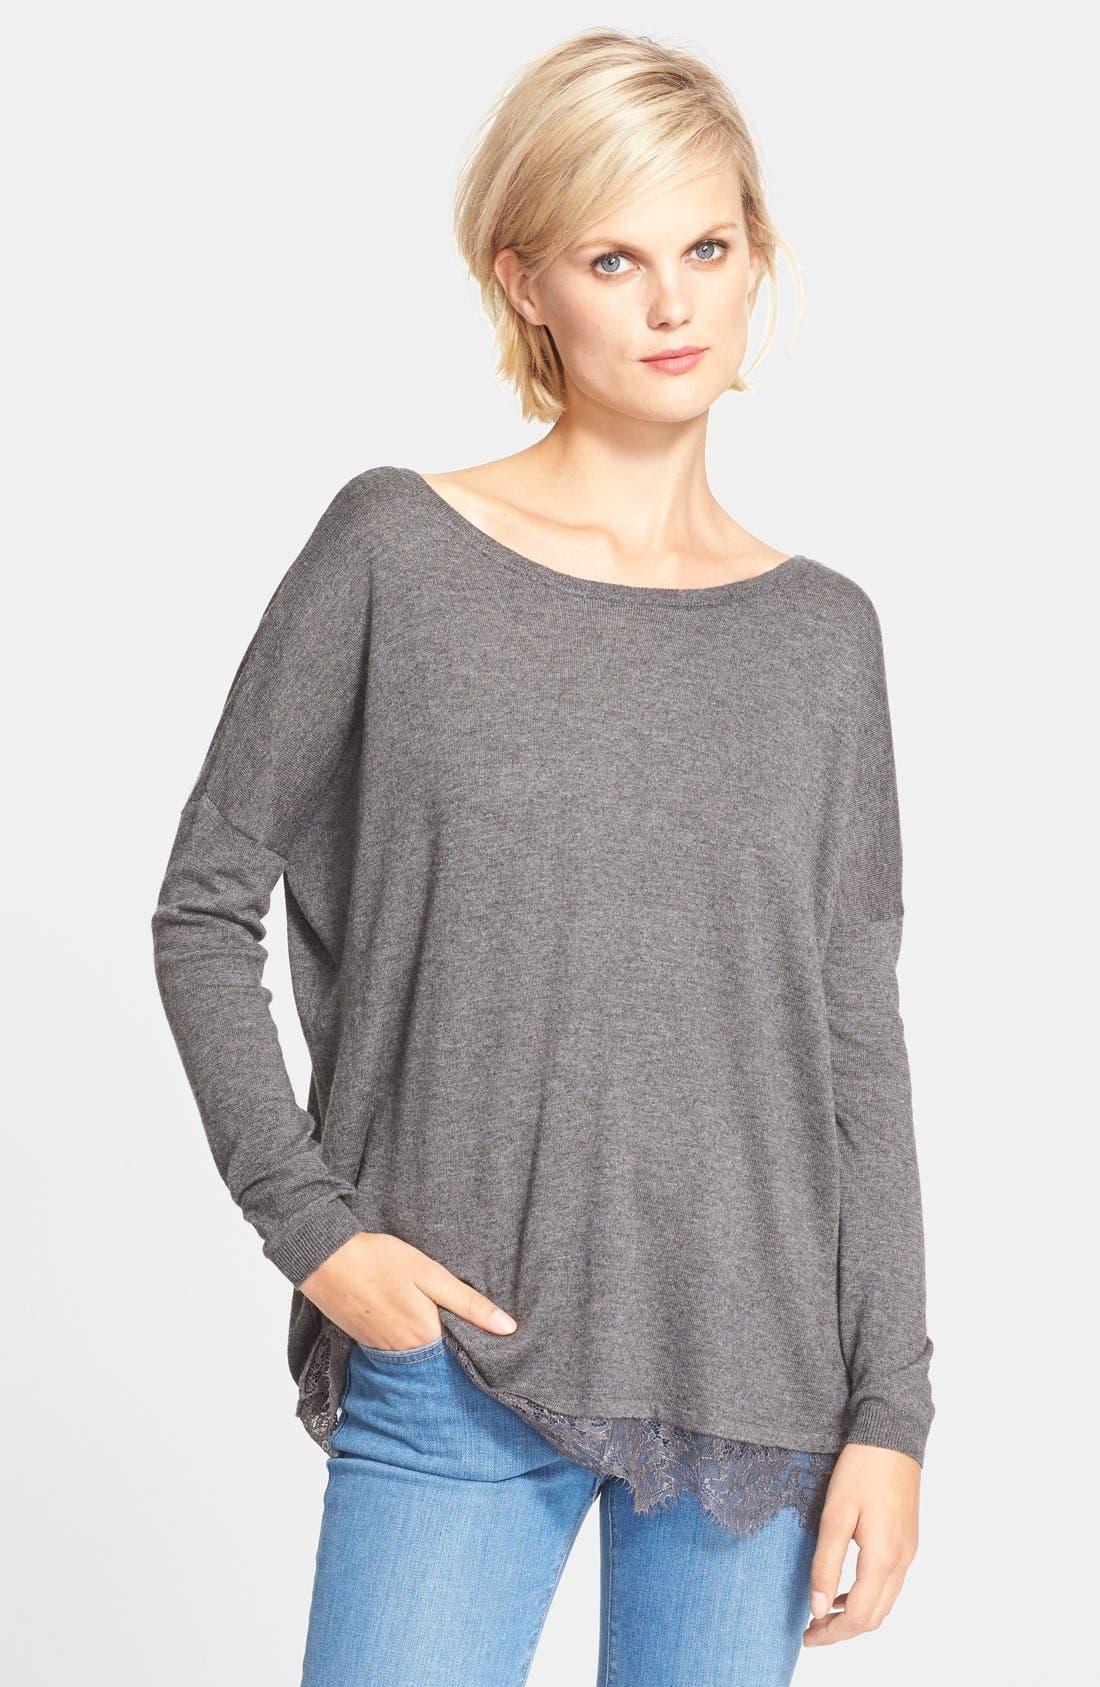 Alternate Image 1 Selected - Joie 'Yael' Lace Hem Sweater